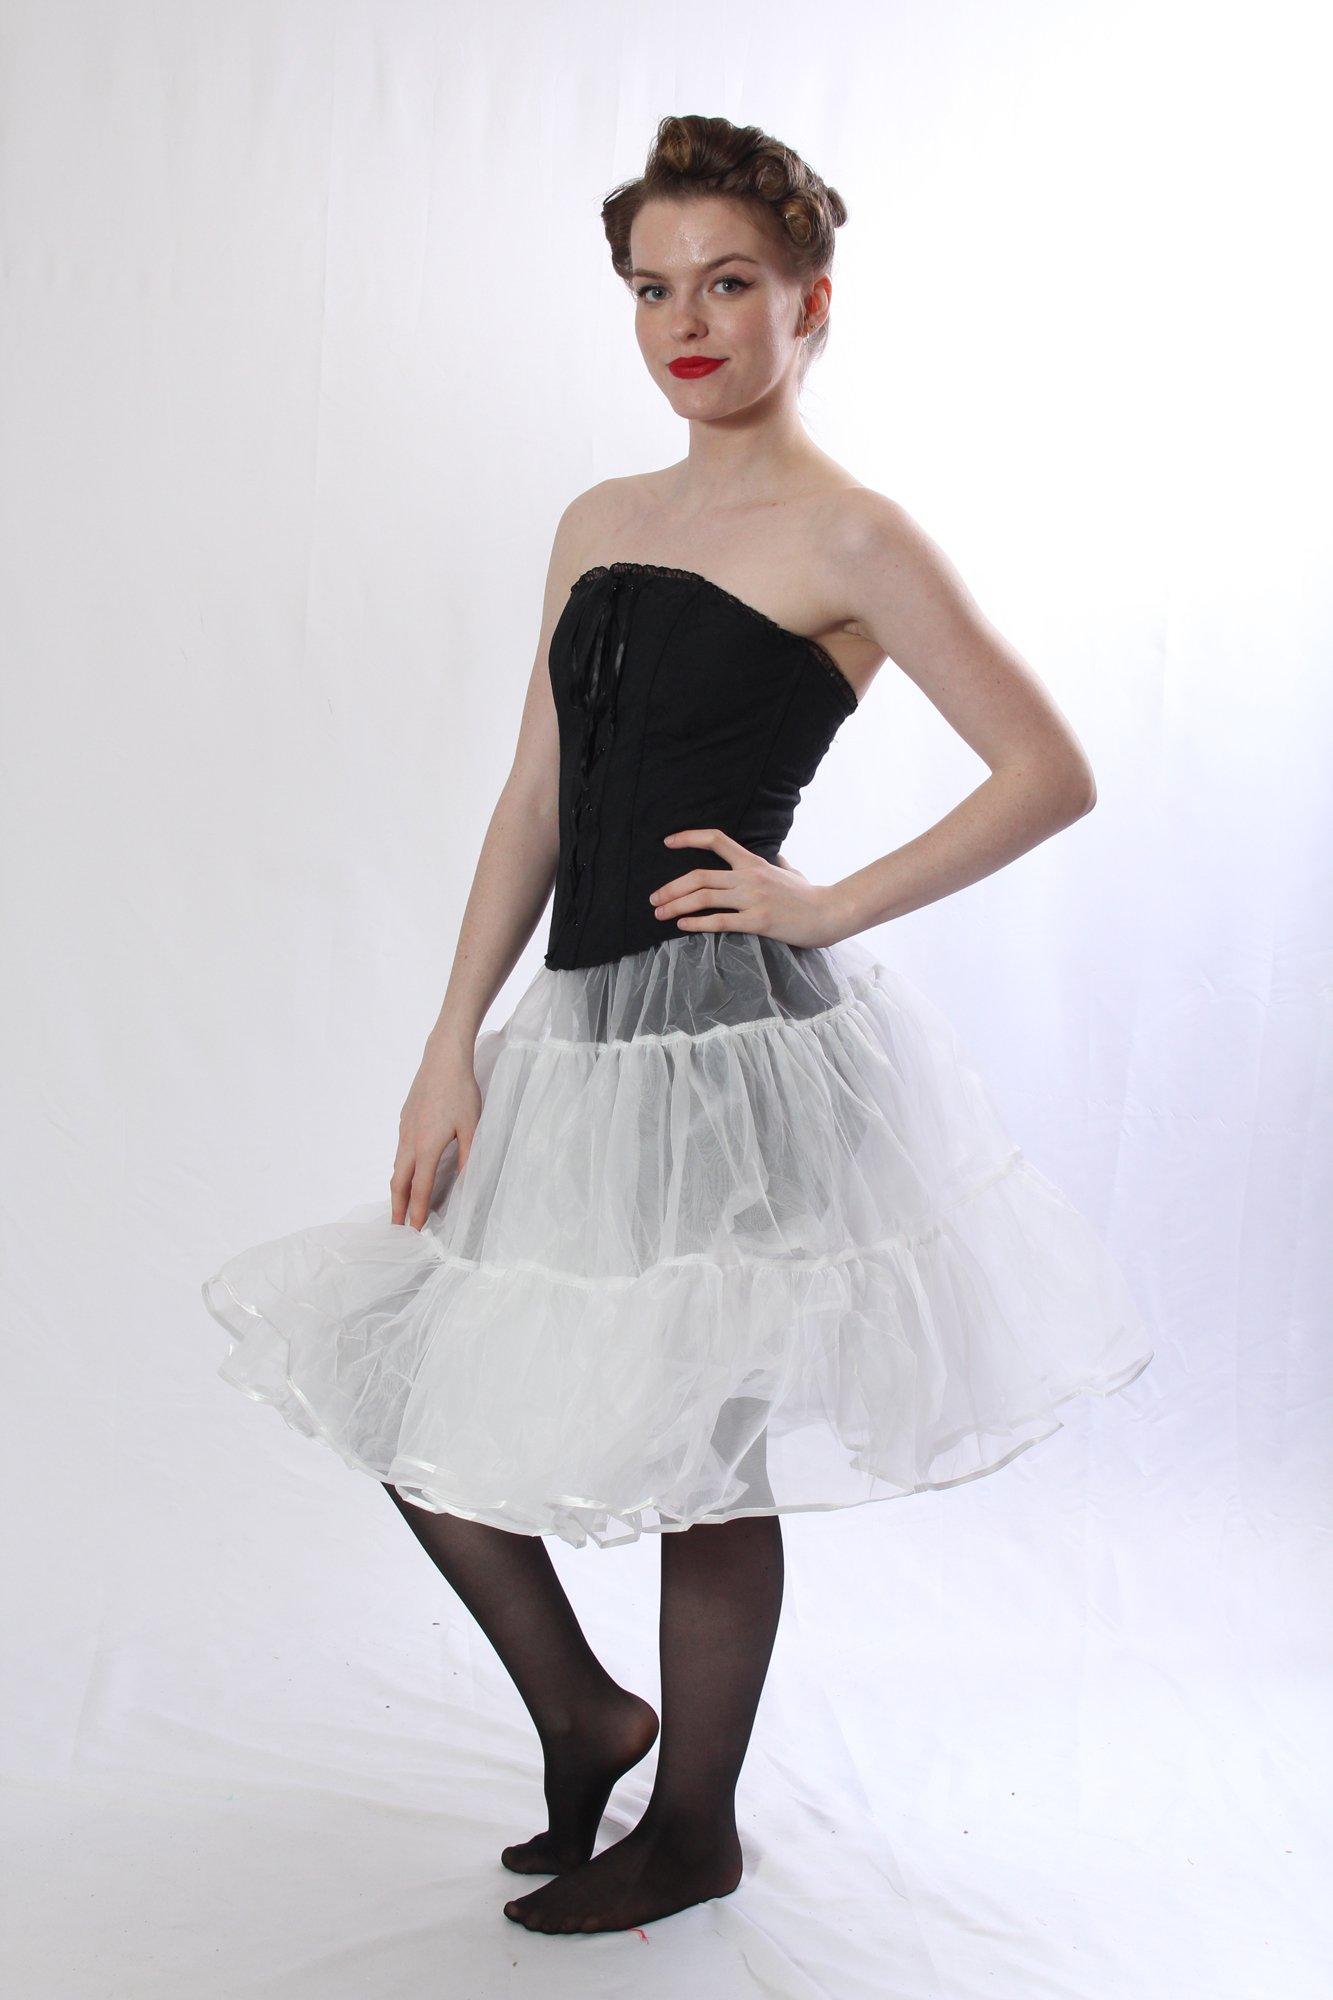 Petticoat Crinoline. Perfect Petticoat Skirt for Vintage Dresses, Petticoat Dresses, Poodle Skirts as Rockabilly Adult Tutu Skirt. Tulle Fabric; 22' Length - White Petticoat